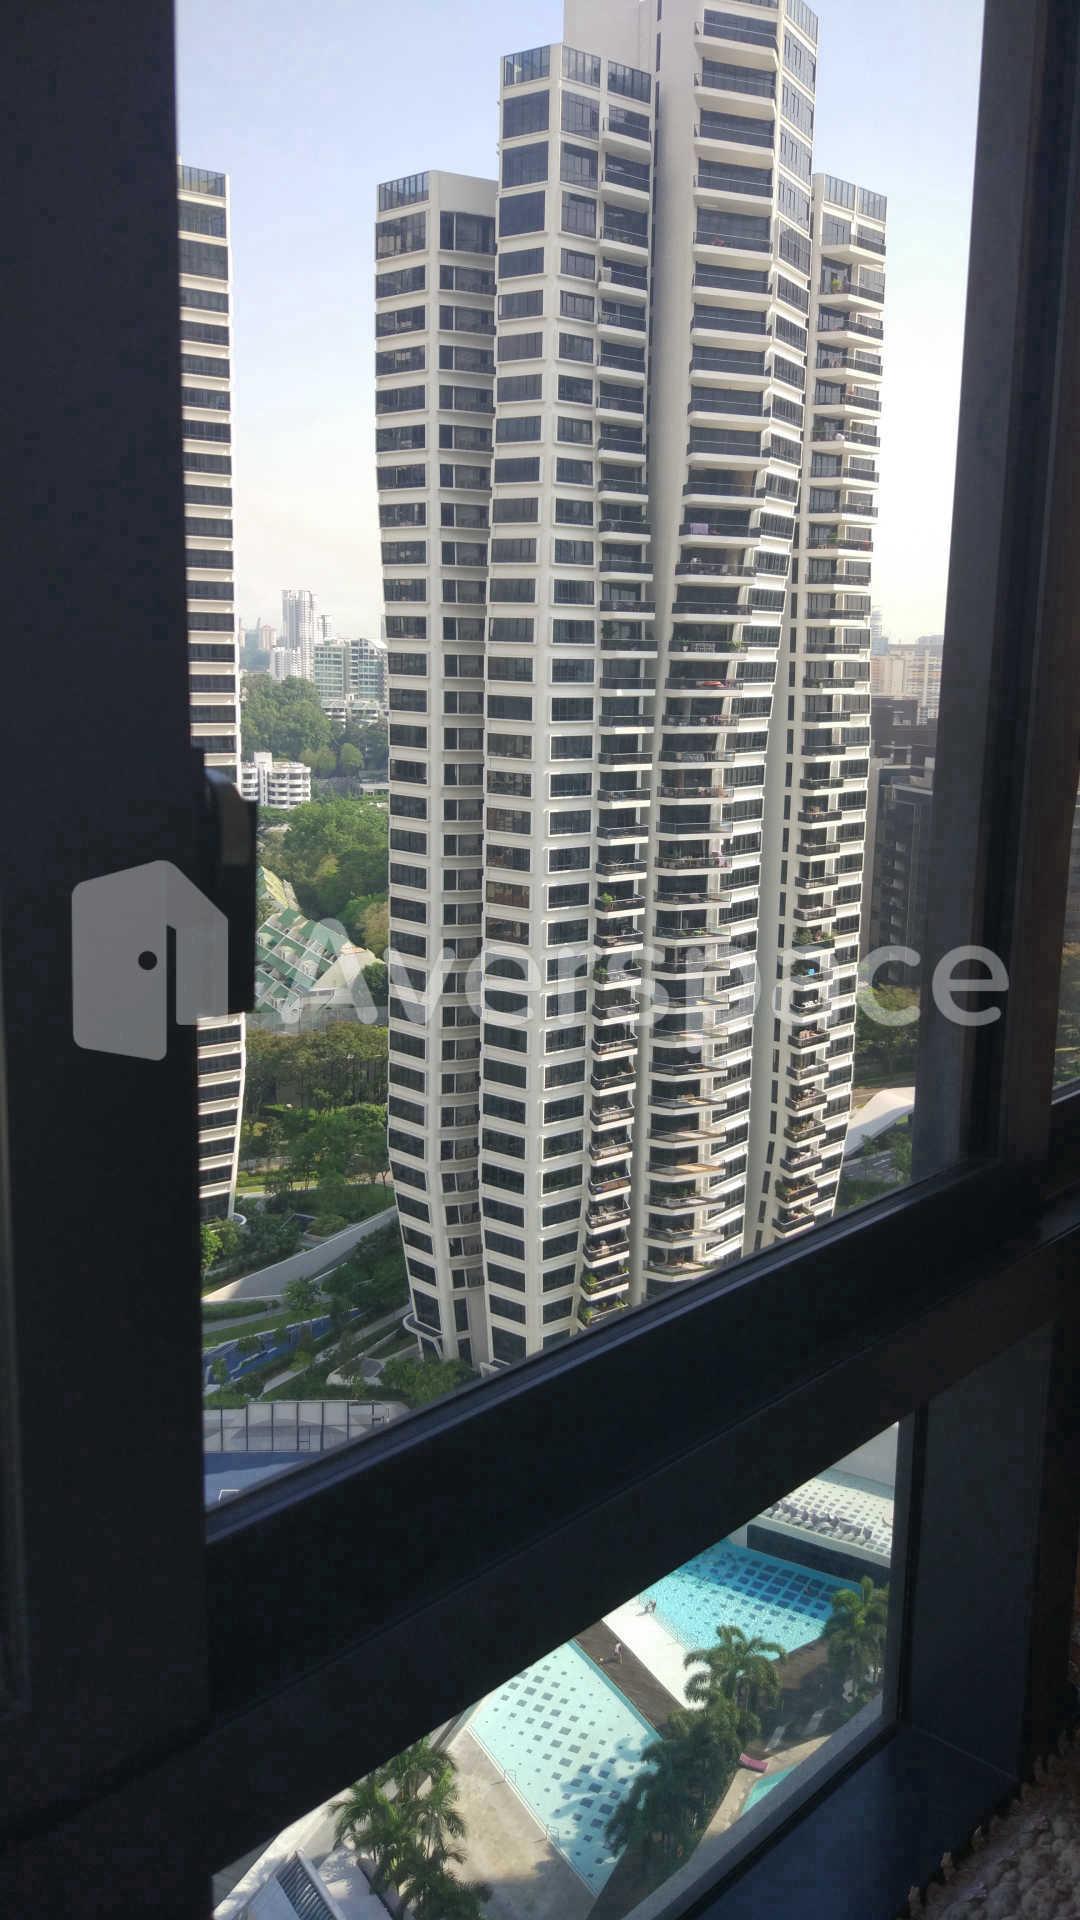 11 Leedon Heights, District 10 Singapore